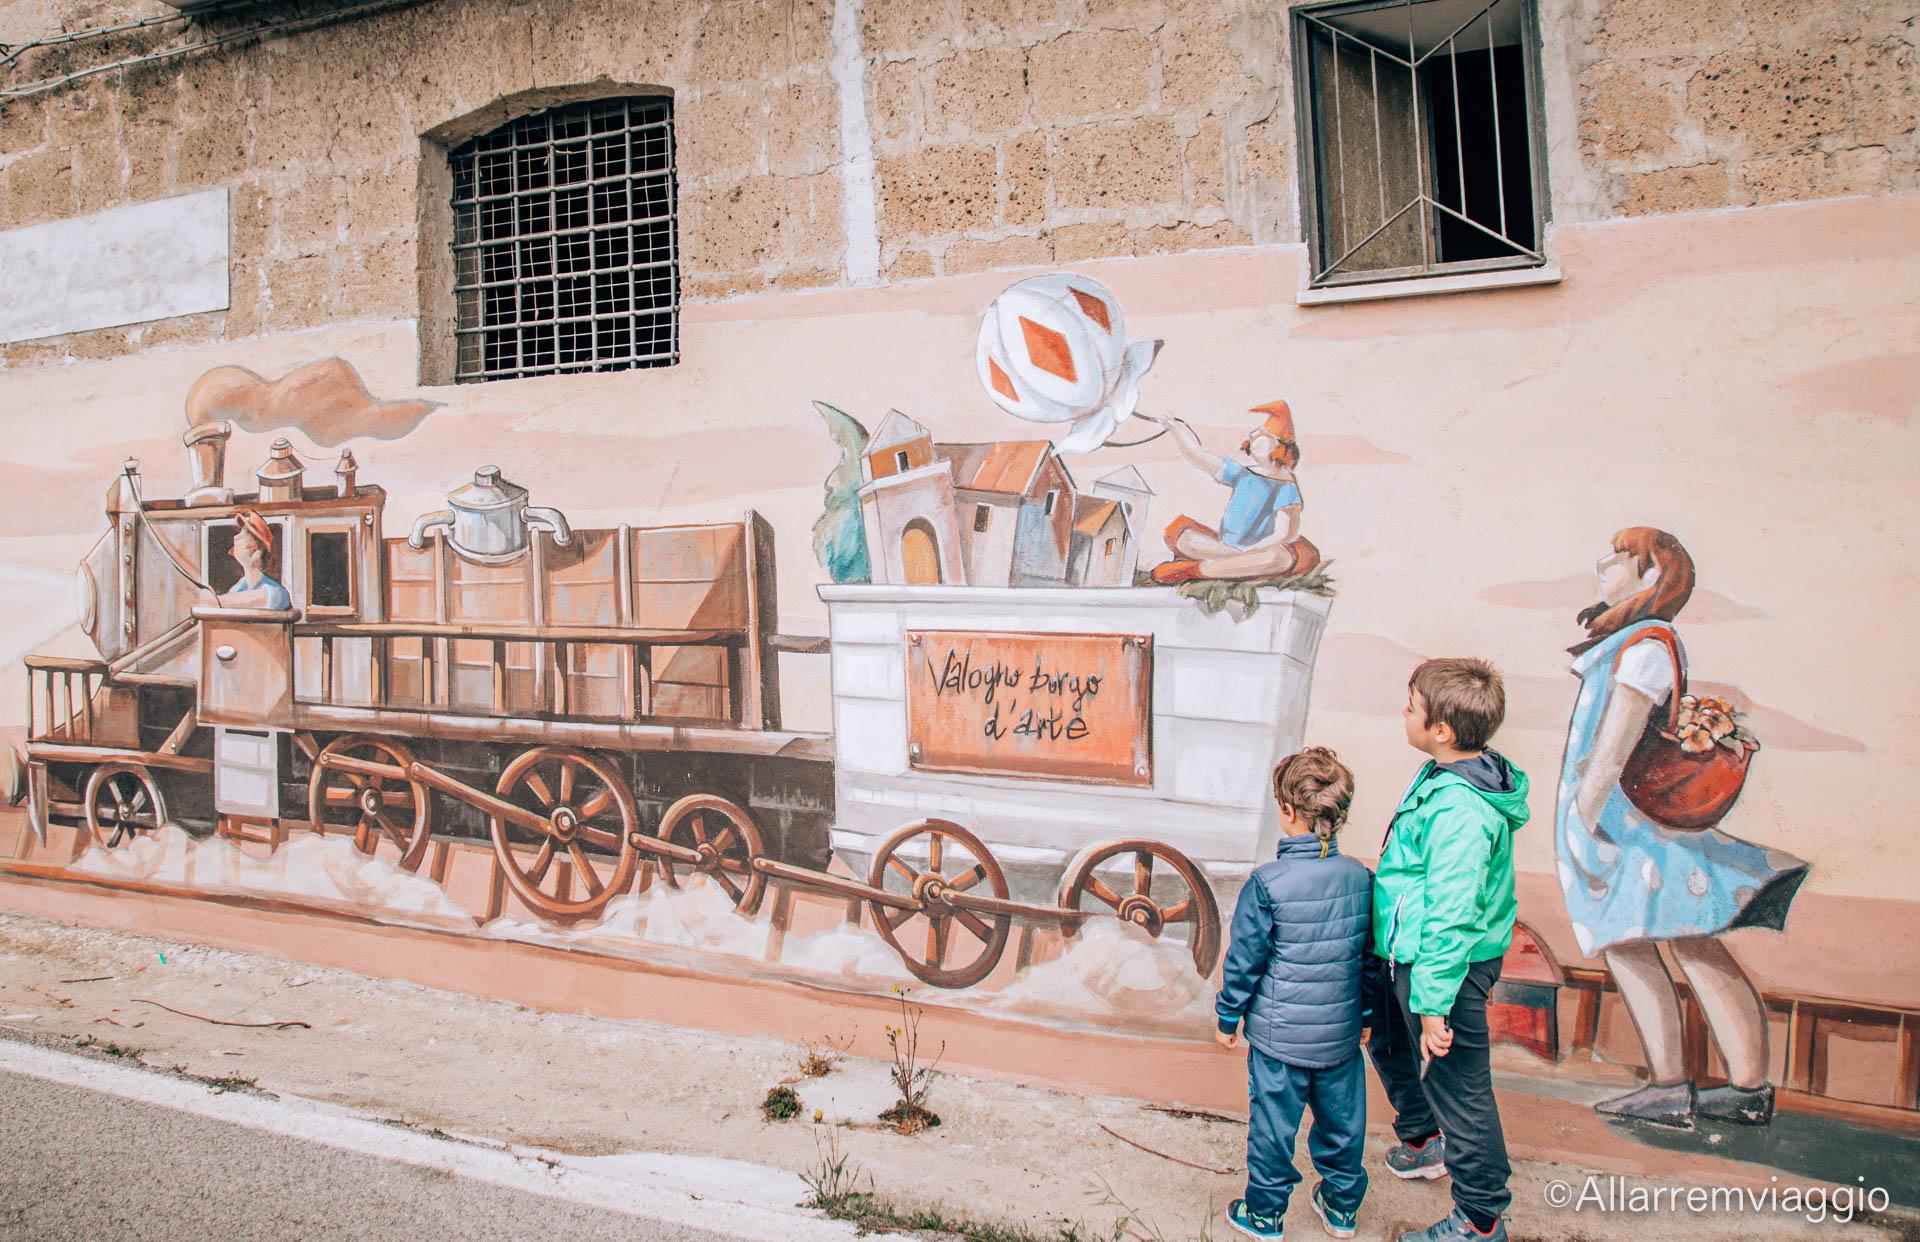 muralesl ocomotiva valogno campania